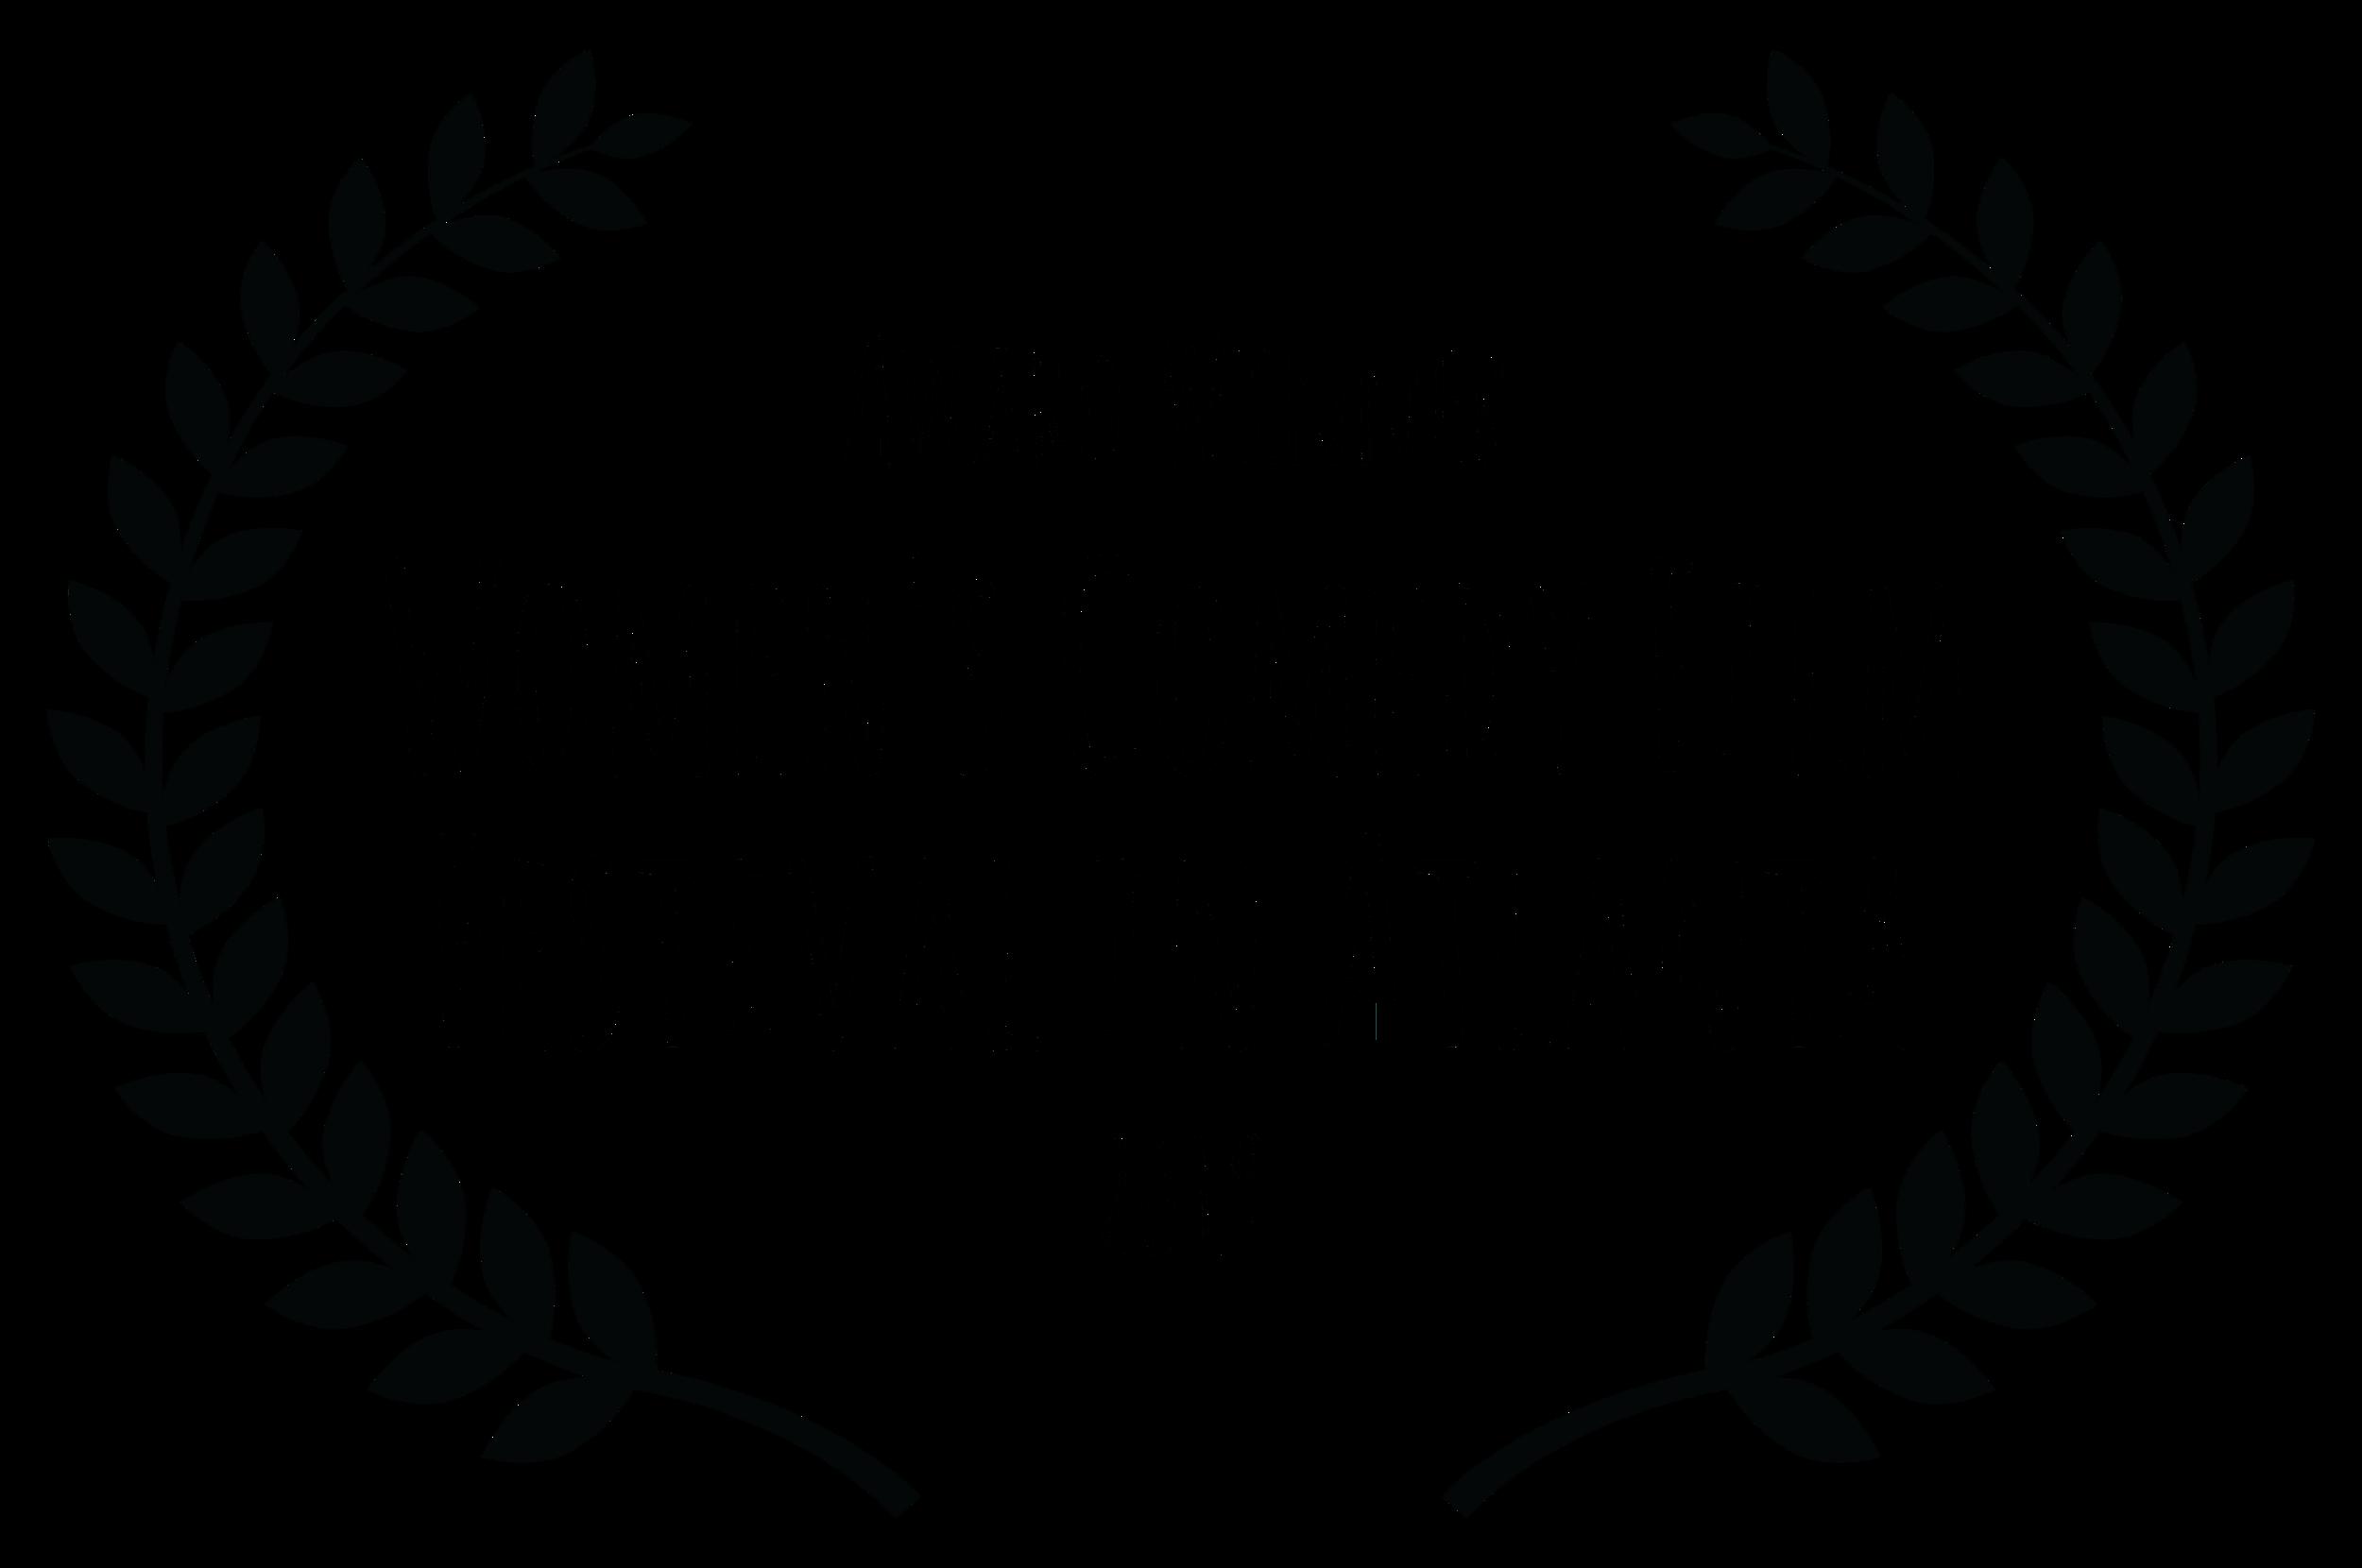 AwardWinner-WomensComedyFilmFestivalinAtlanta-2019 (1).png